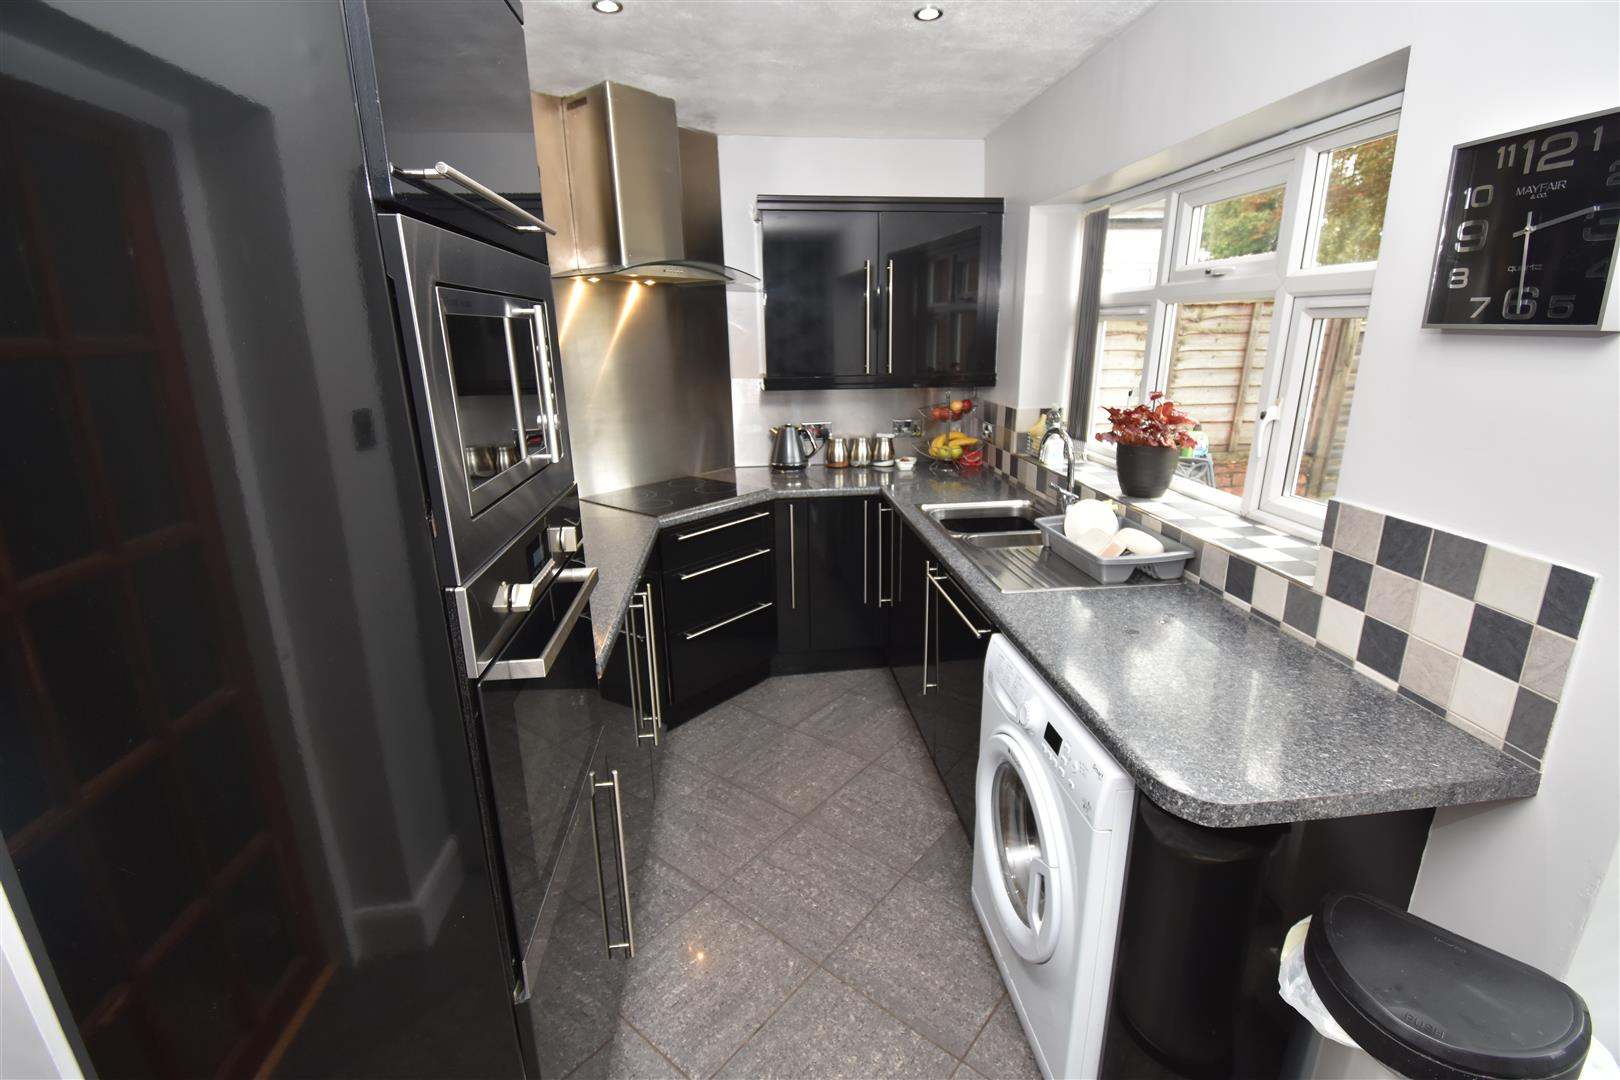 3 bed house for sale in Drews Lane, Birmingham B8 2SL 6